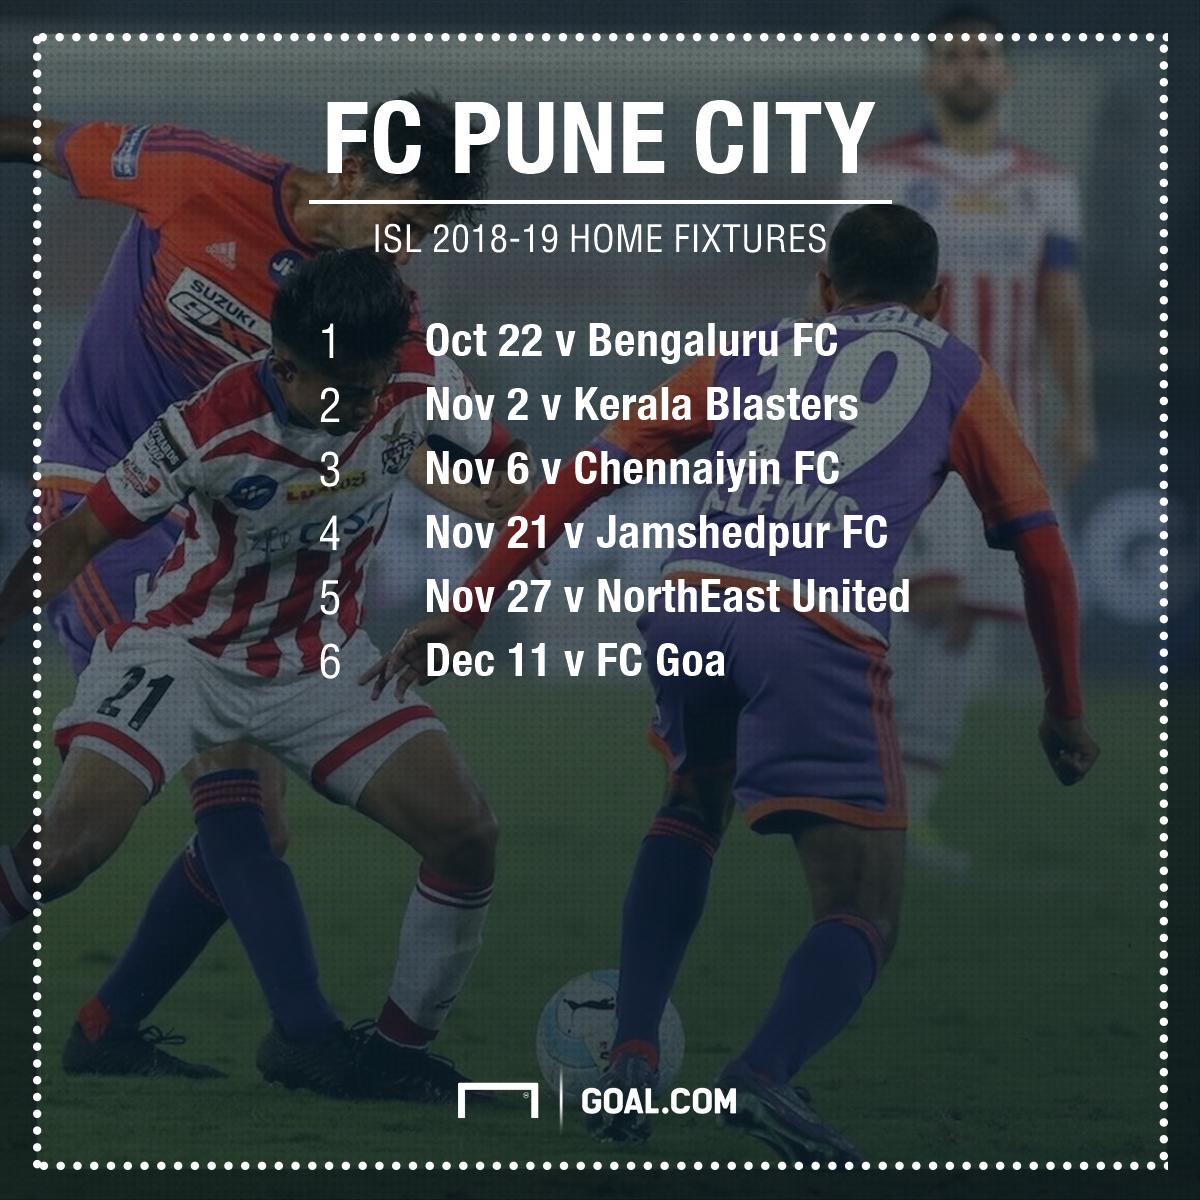 Pune City fixtures